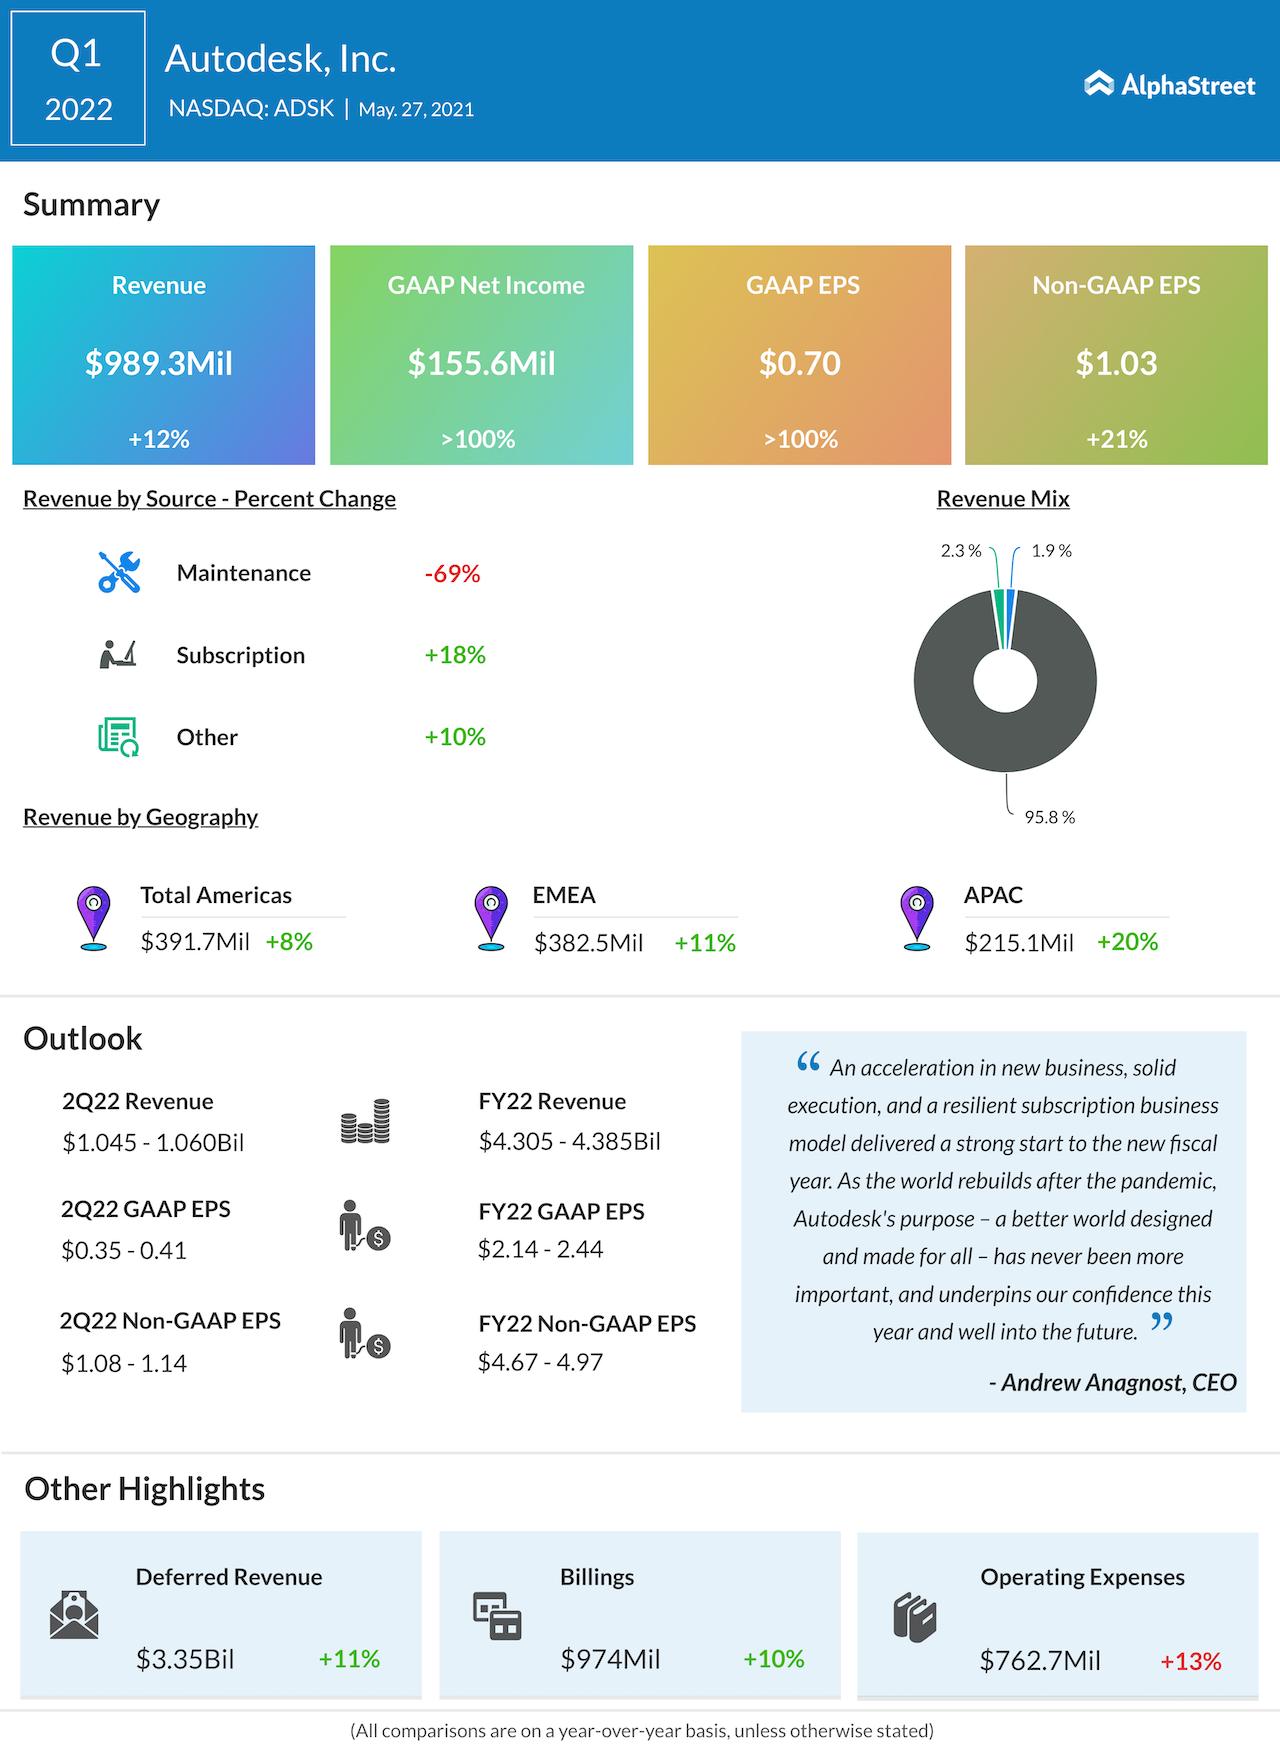 autodesk Q1 2022 earnings